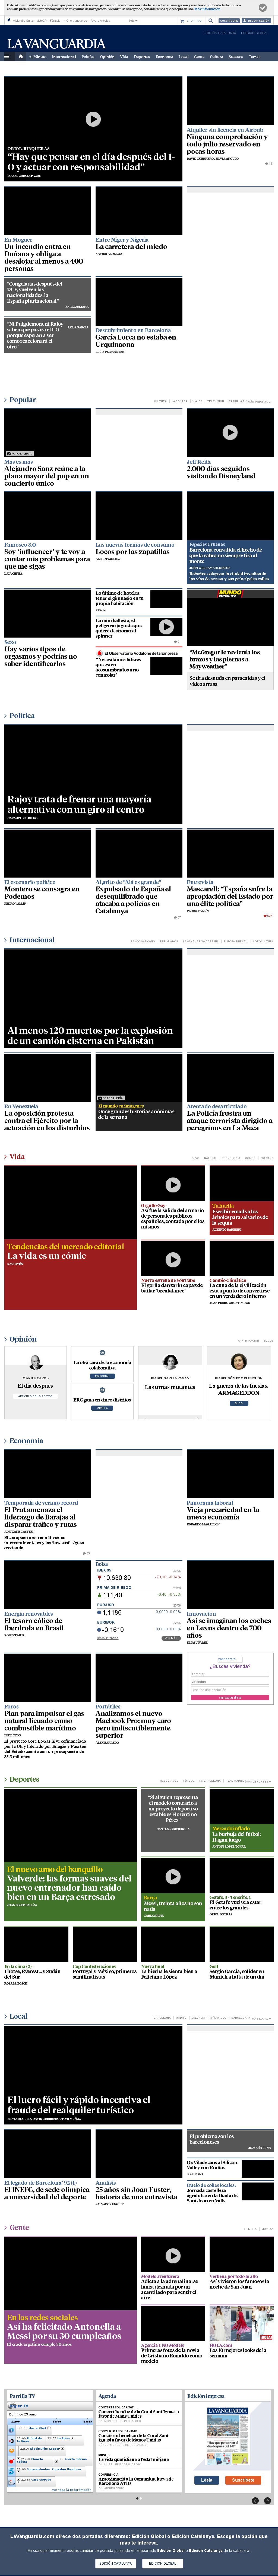 La Vanguardia at Sunday June 25, 2017, 8:20 a.m. UTC